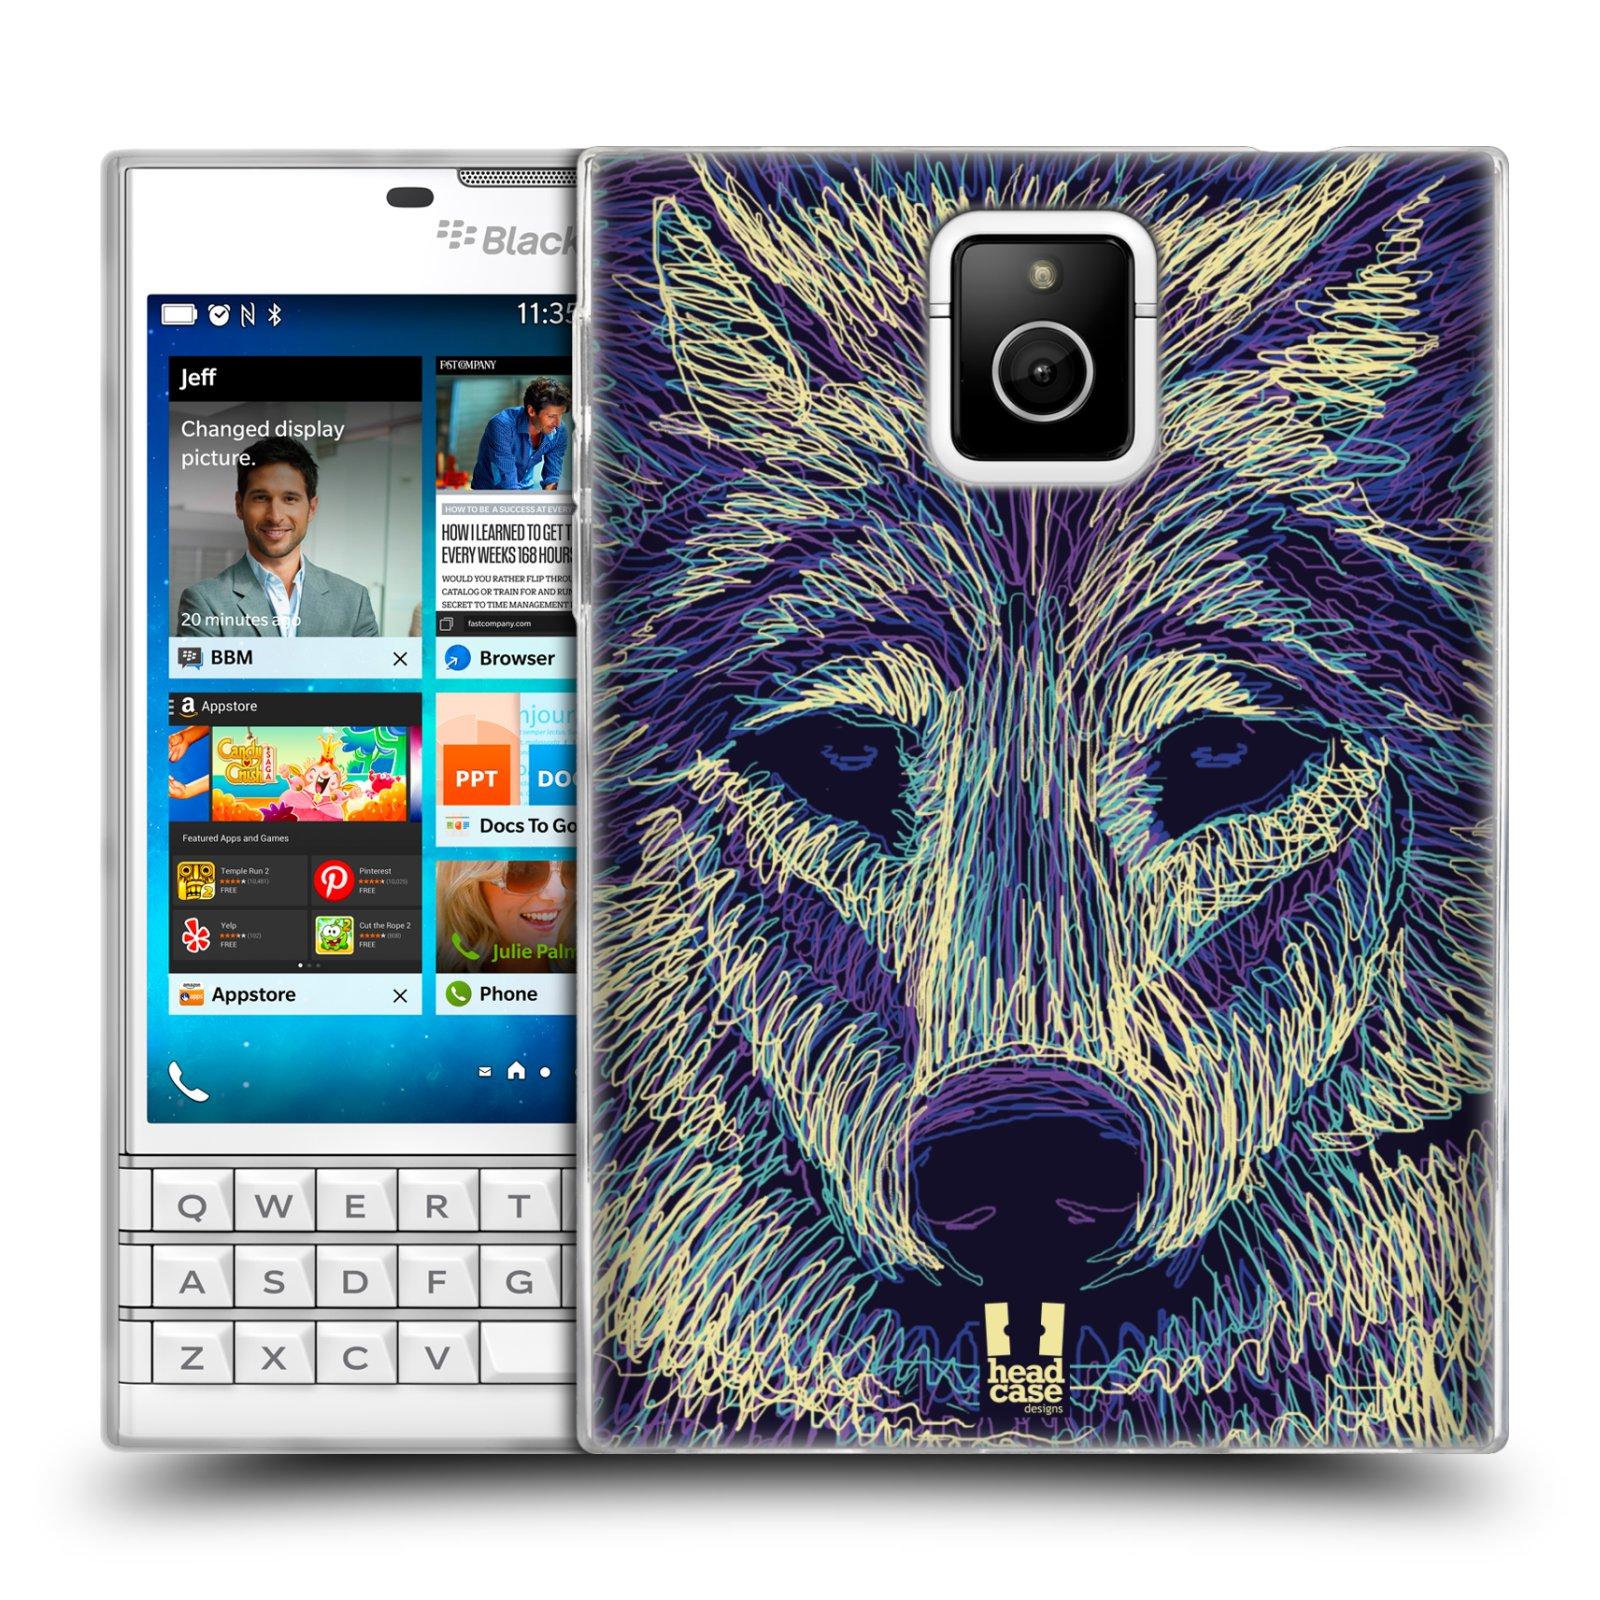 HEAD CASE silikonový obal na mobil Blackberry PASSPORT vzor zvíře čmáranice vlk